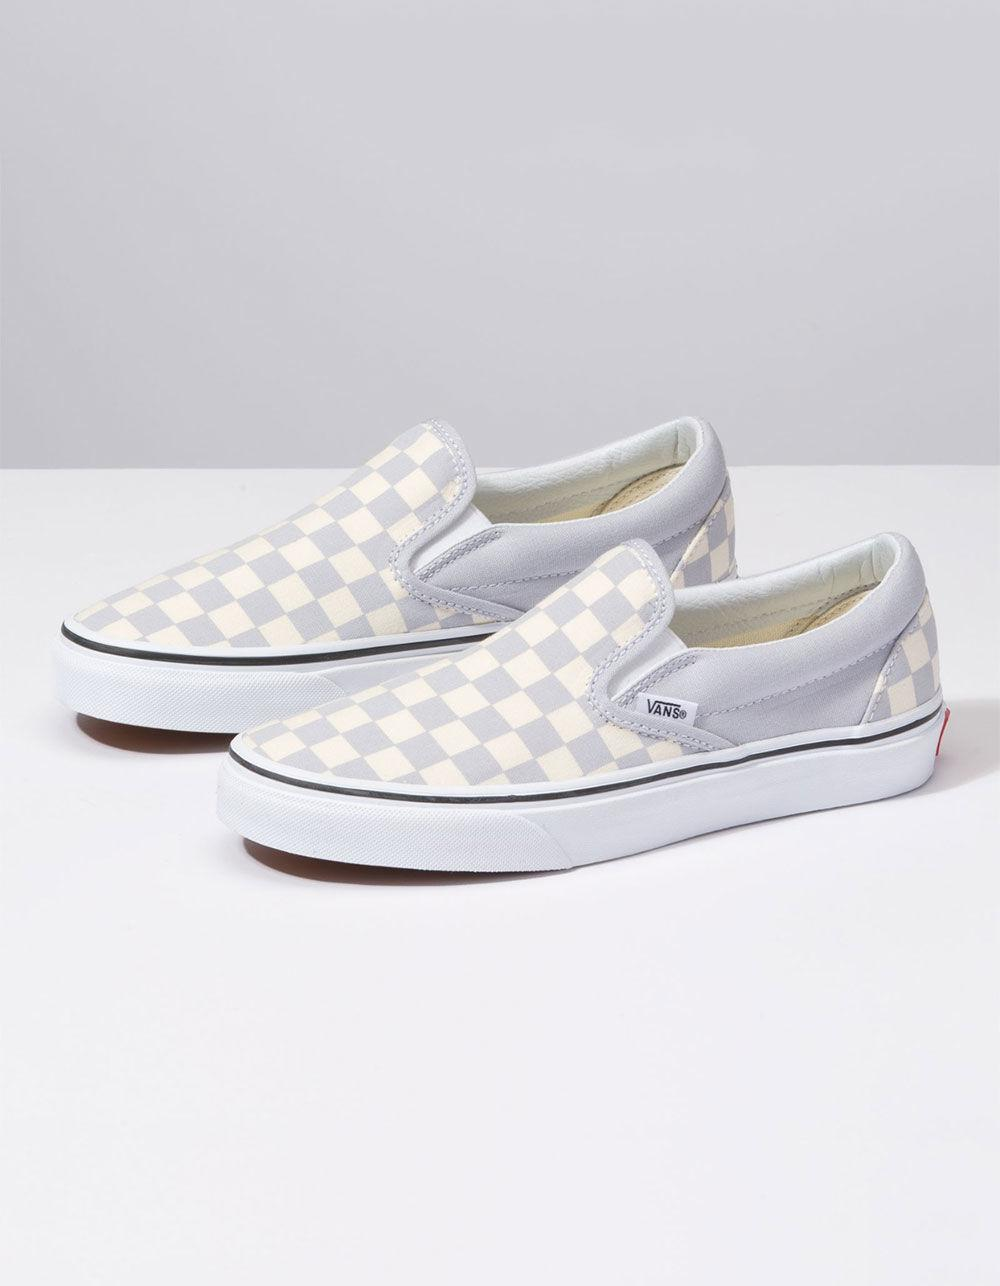 bdf3b273edb Lyst - Vans Checkerboard Gray Dawn   True White Womens Slip-on Shoes in  White